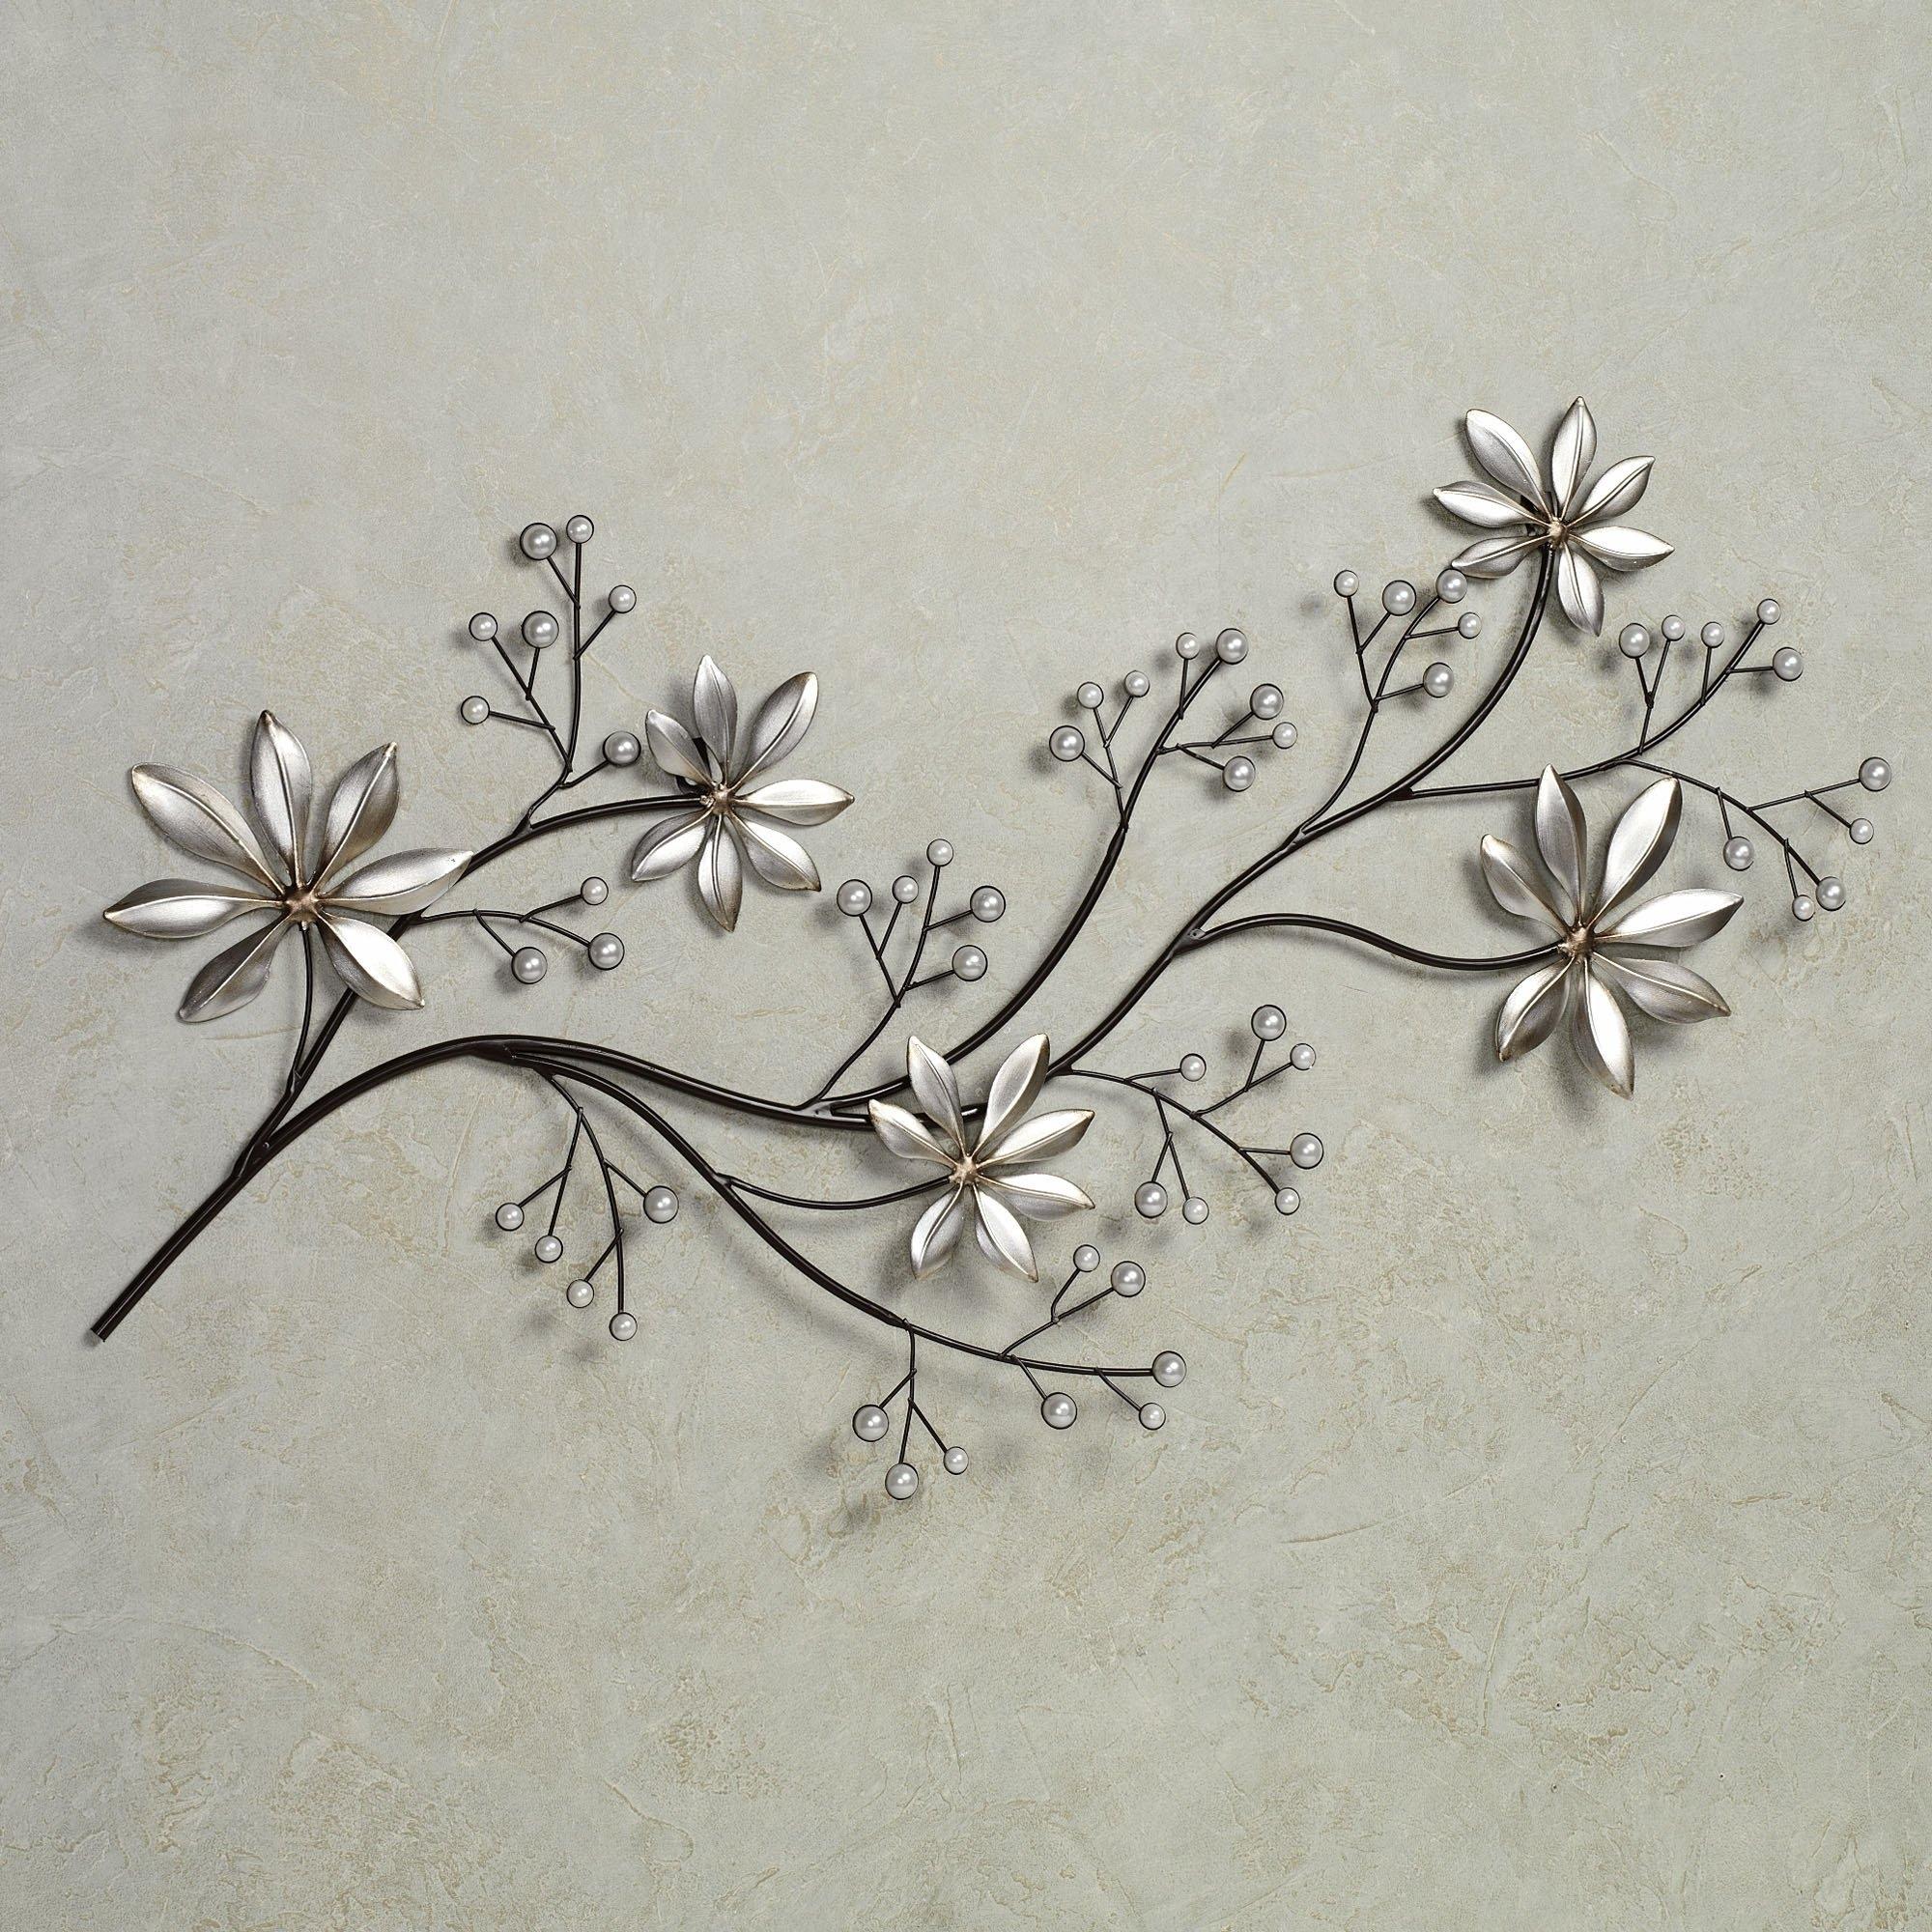 Silver Metal Wall Art Flowers - Elitflat pertaining to Silver Metal Wall Art (Image 15 of 20)